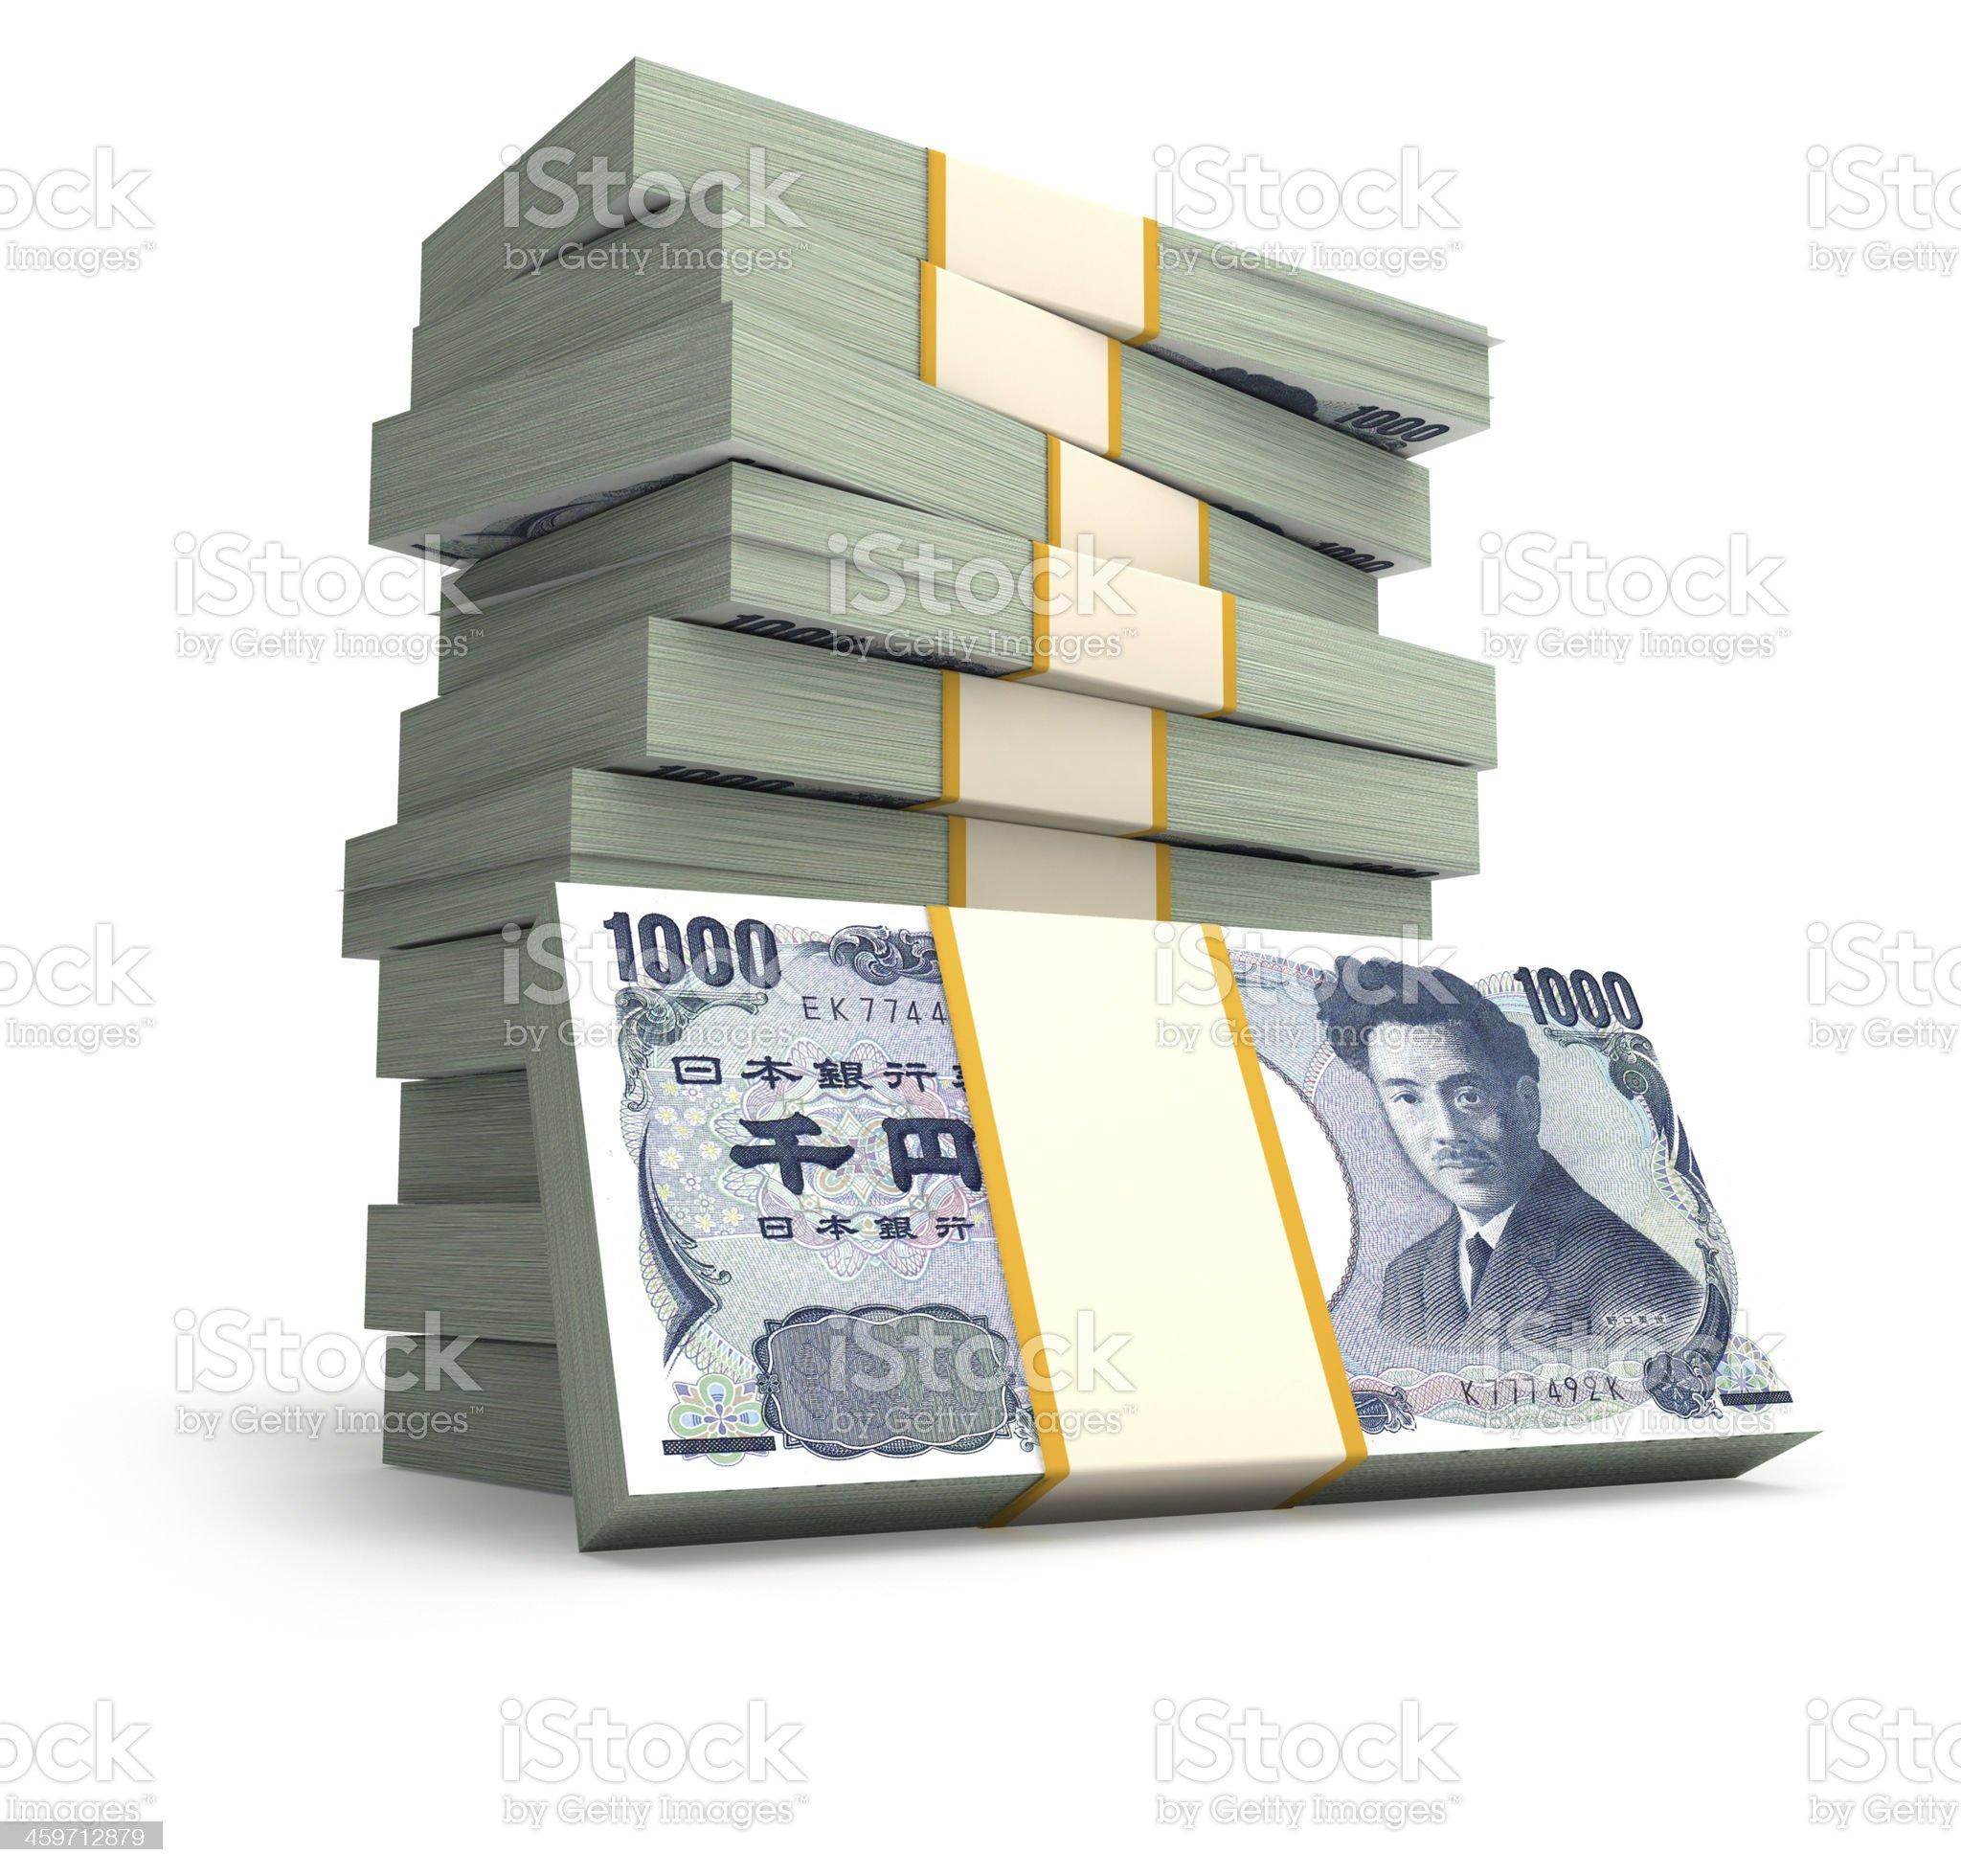 Stack of Japanese Yen bills royalty-free stock photo